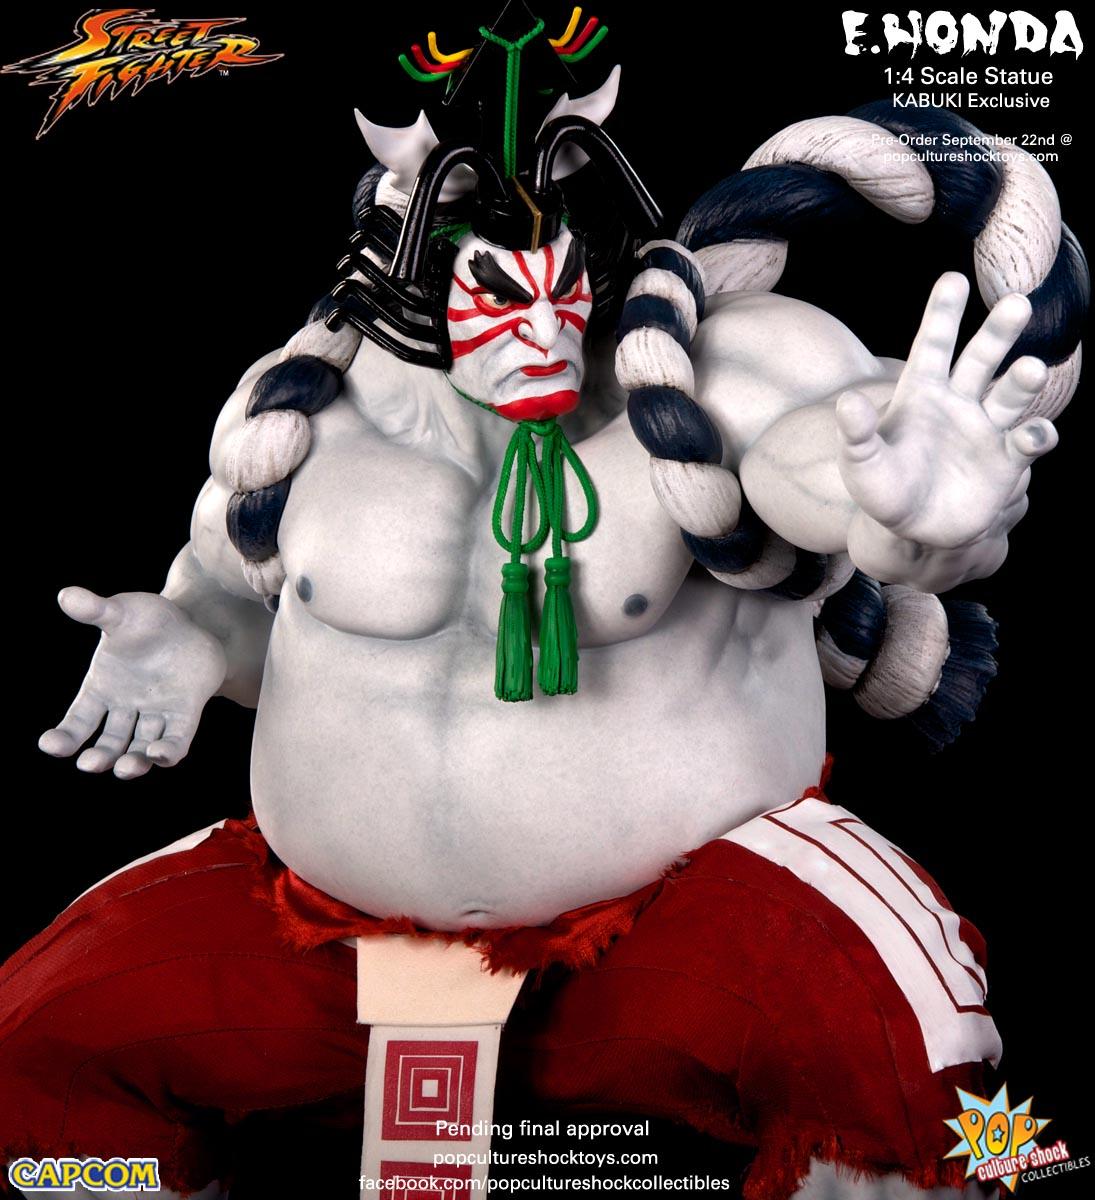 [Pop Culture Shock] Street Fighter: E. Honda 1/4 Statue - Página 3 Street-Fighter-E.-Honda-Kabuki-Statue-019